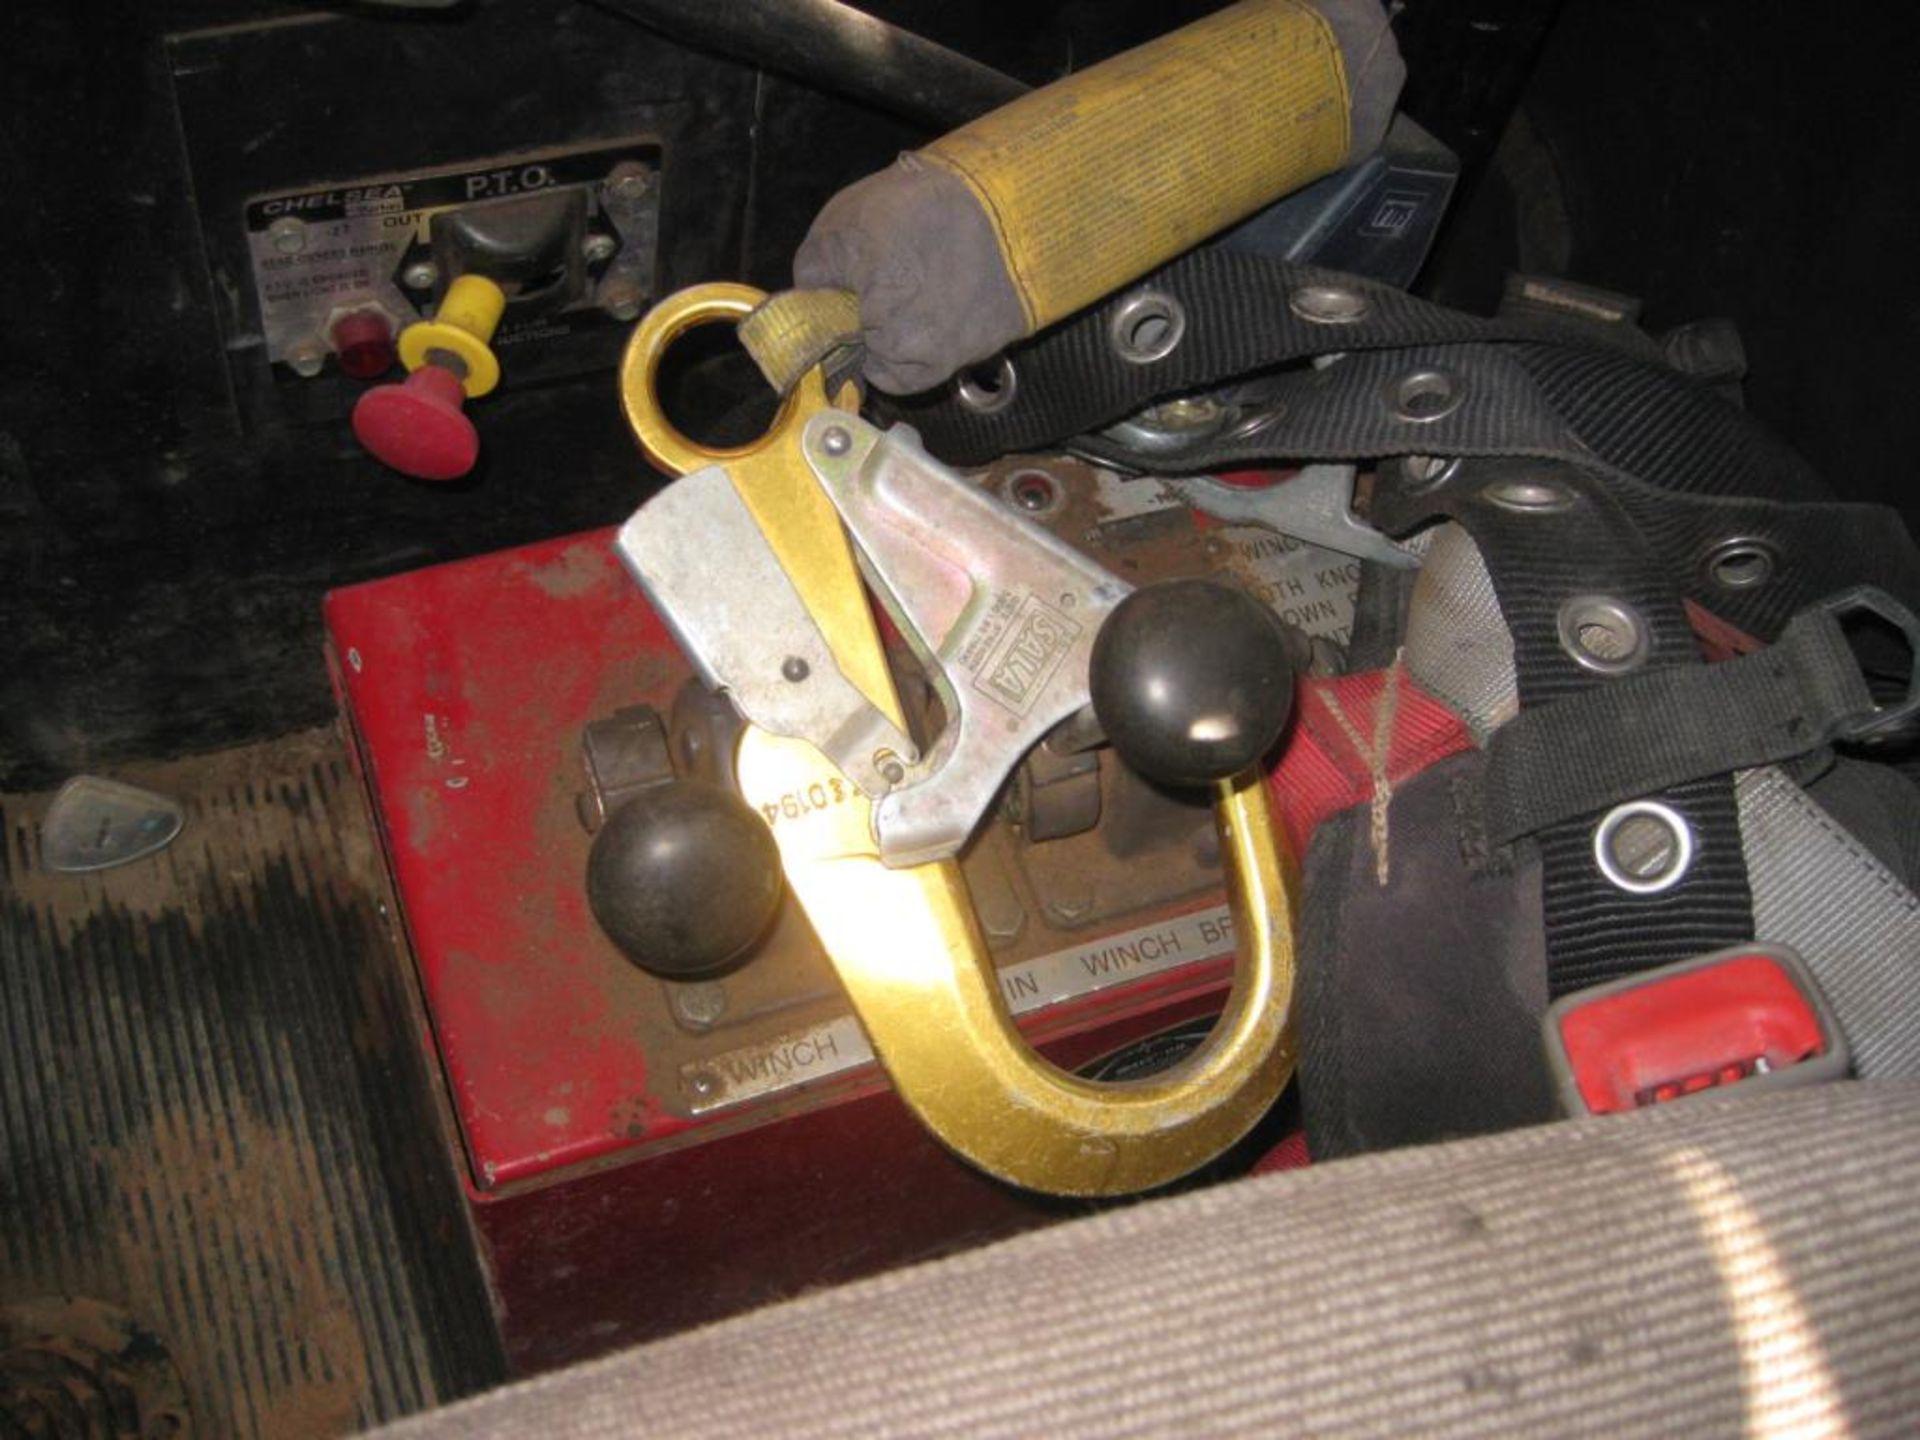 Kenworth Winch Truck - Image 17 of 27